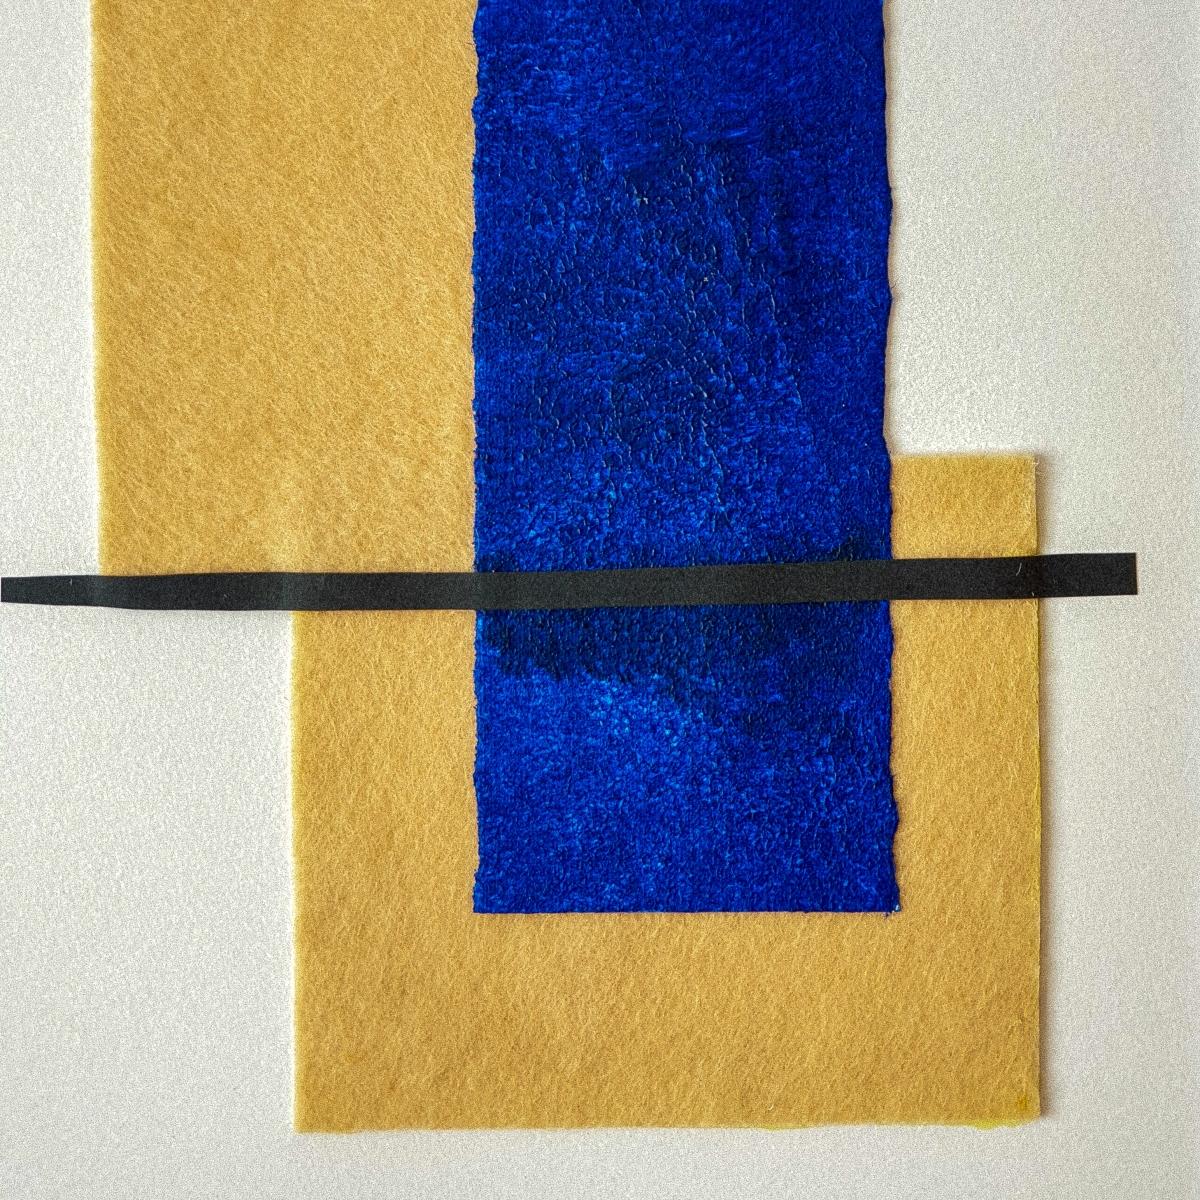 "Detalle del cuadro abstracto ""The island"", por Tatuska"